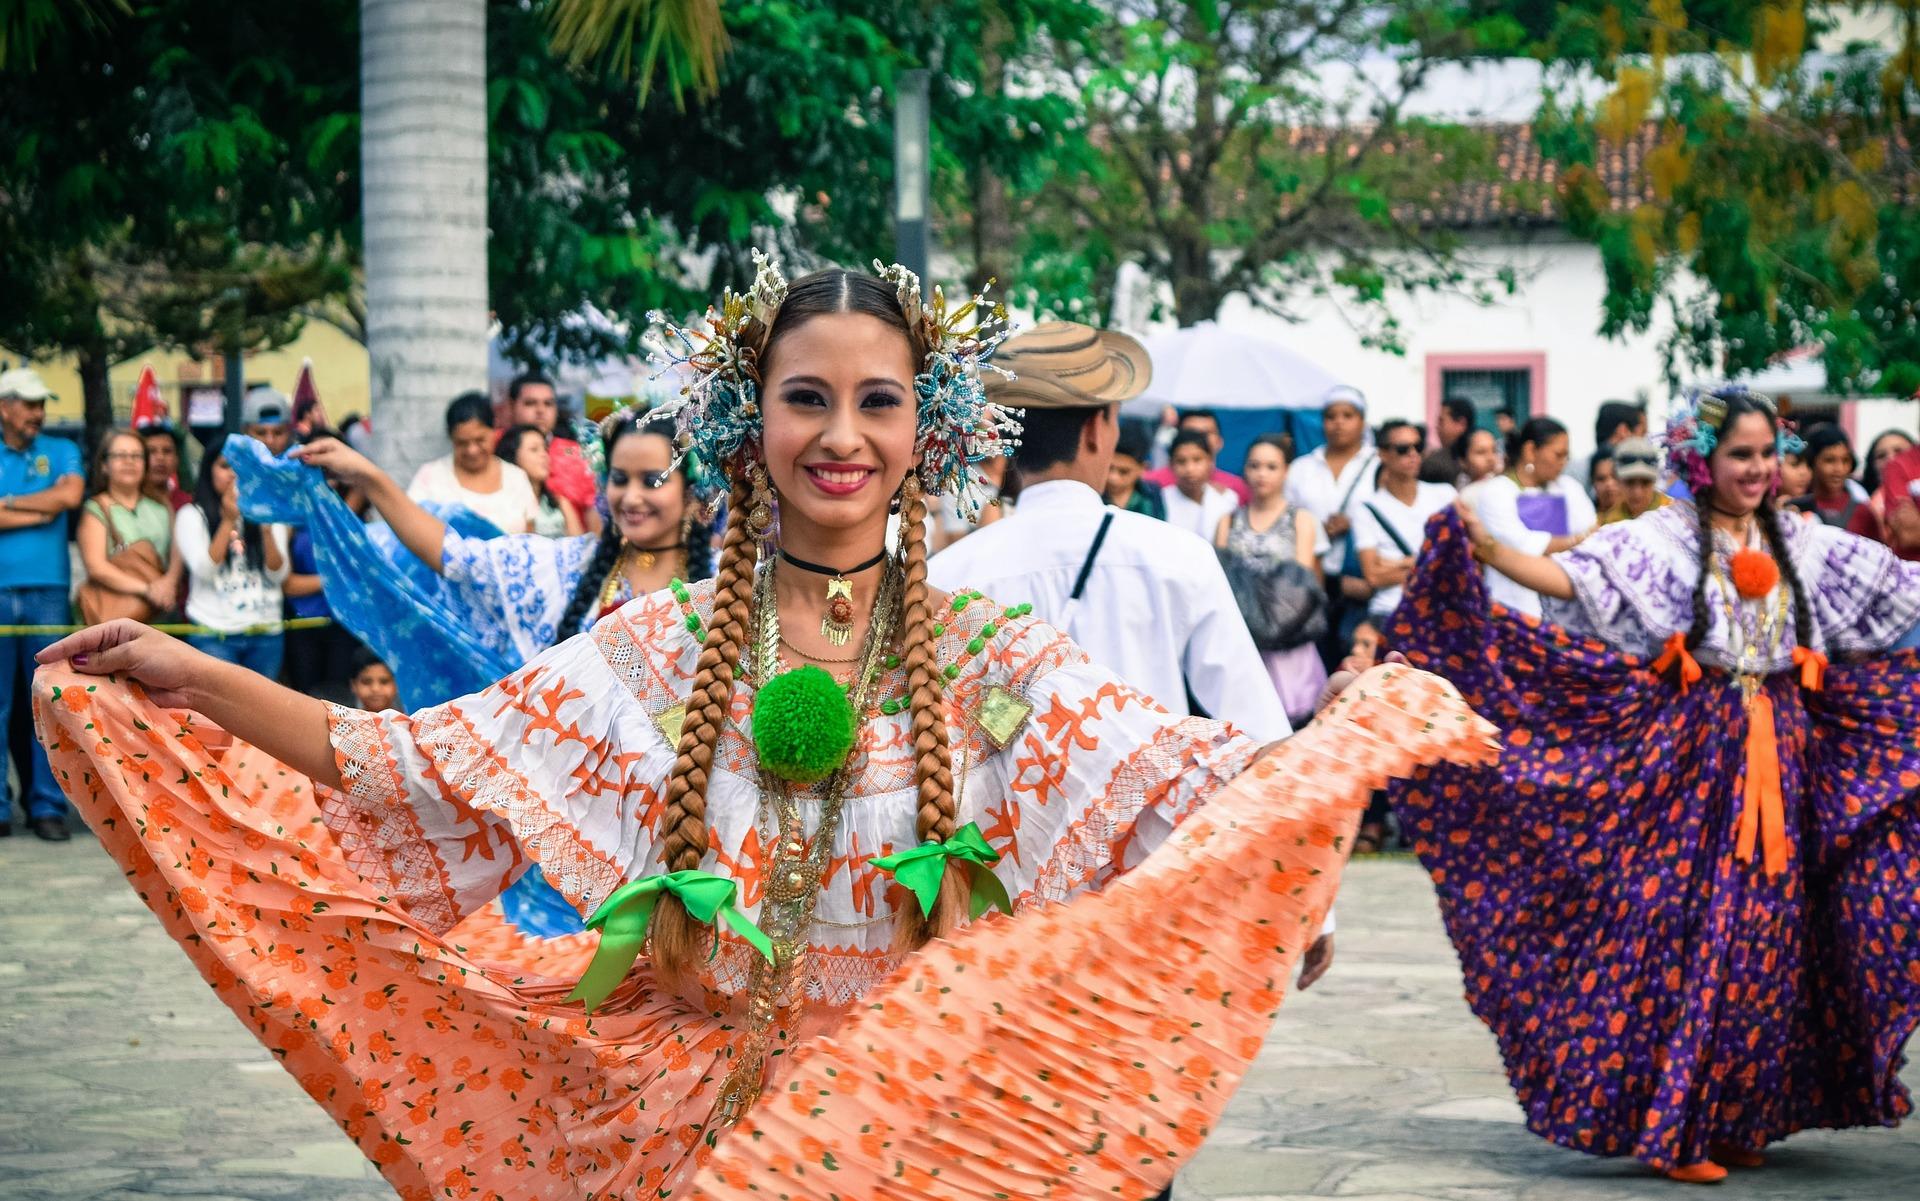 Guanacaste Day typical dress